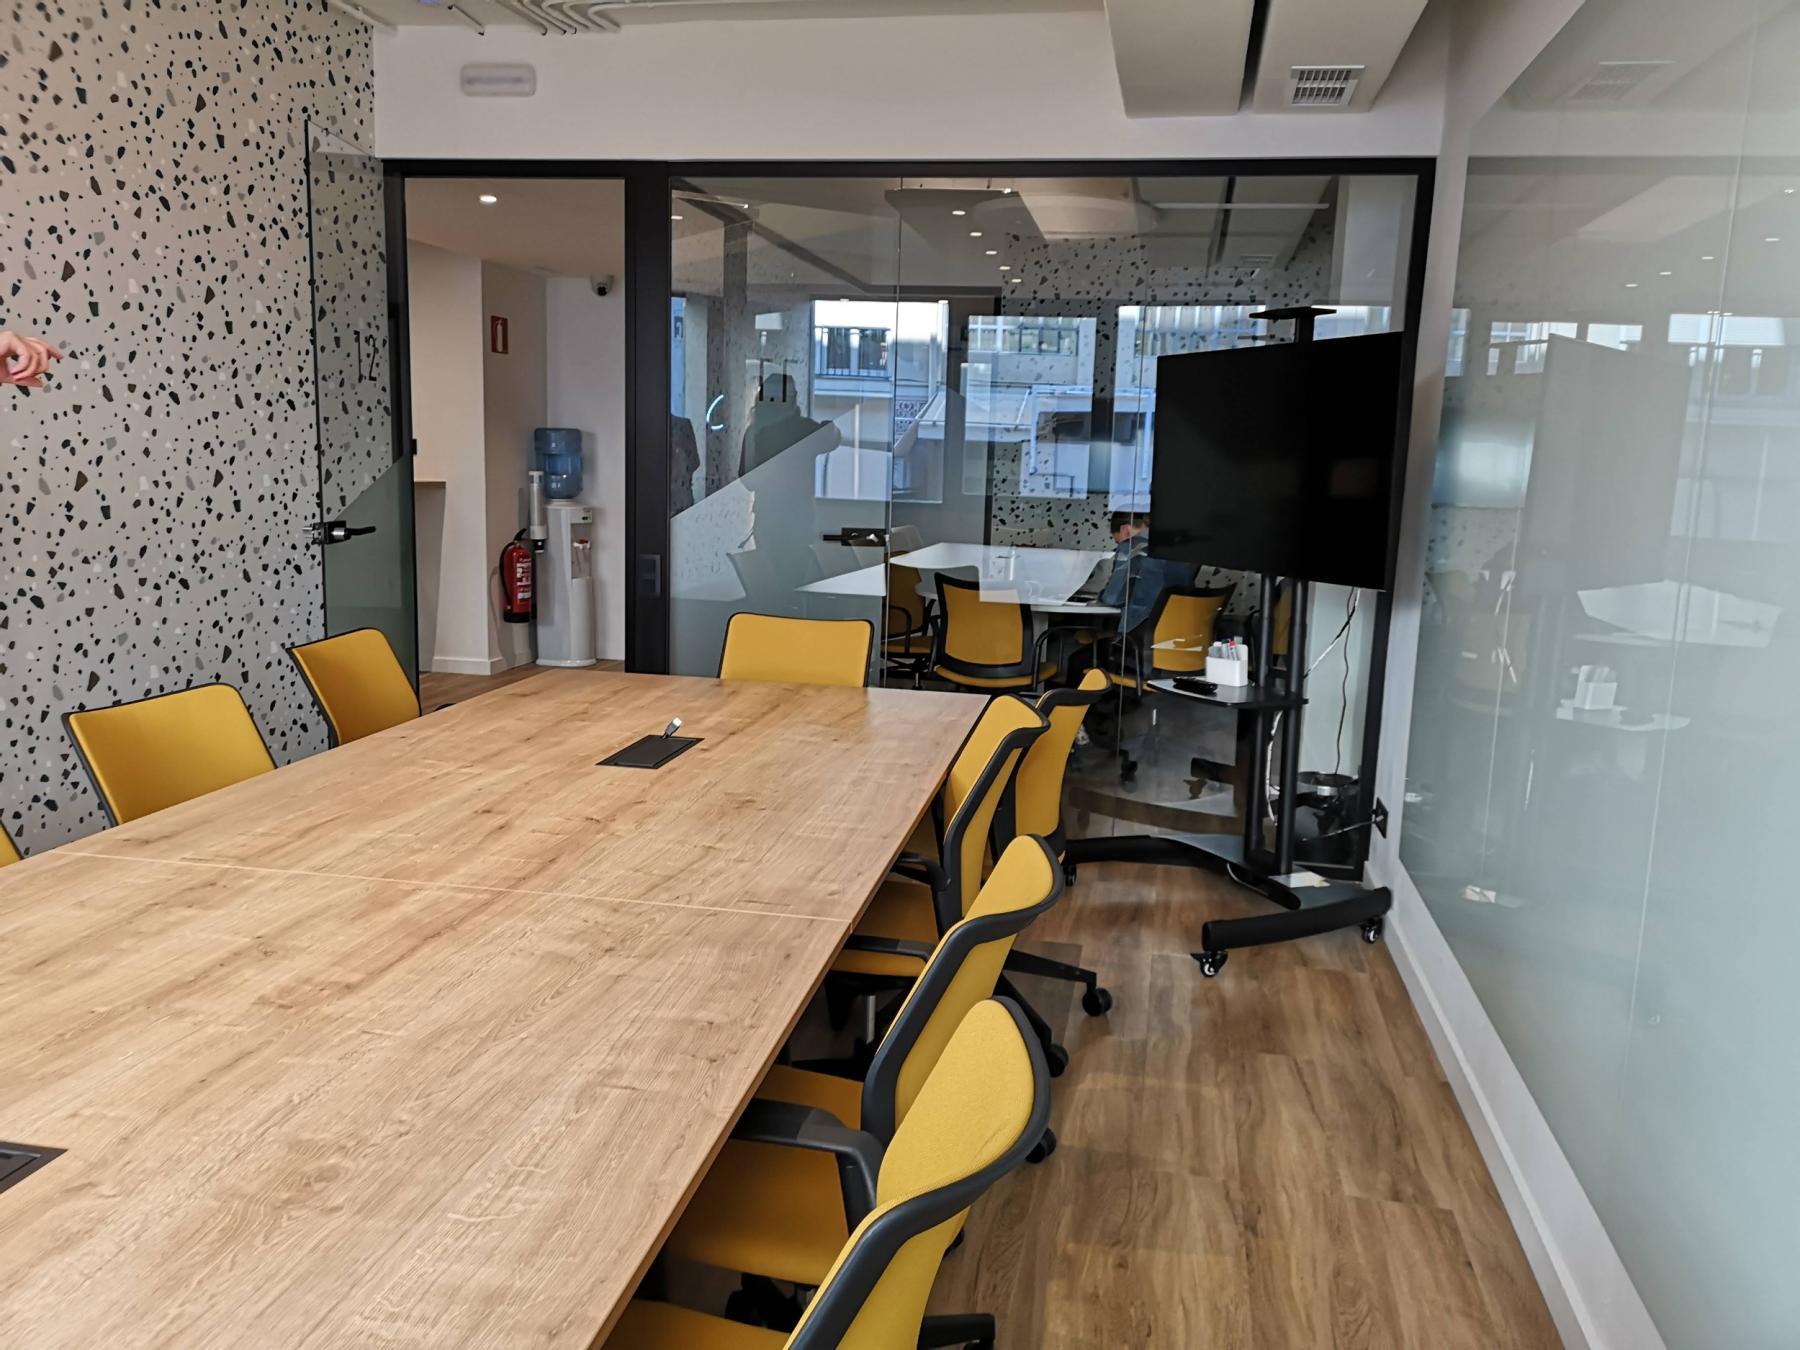 Alquilar oficinas Riera de Sant Miquel 1, Barcelona (14)